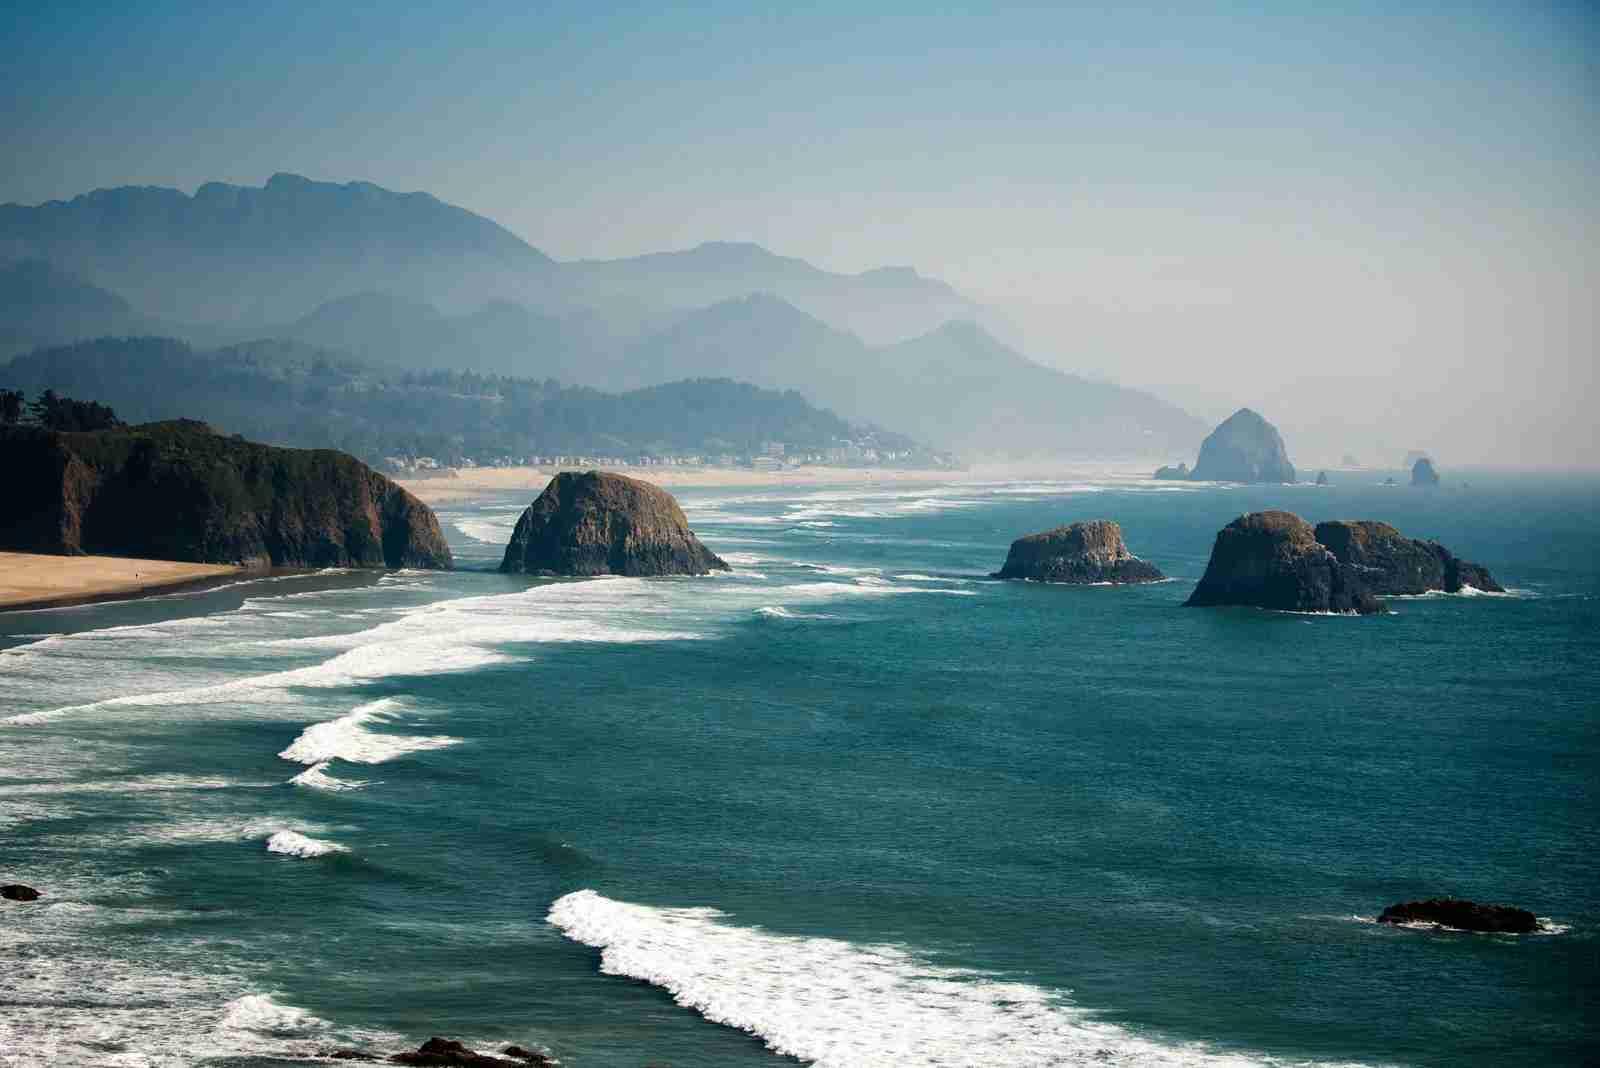 Haystack Rock. (Photo by Carmen Martínez Torrón / Getty Images)